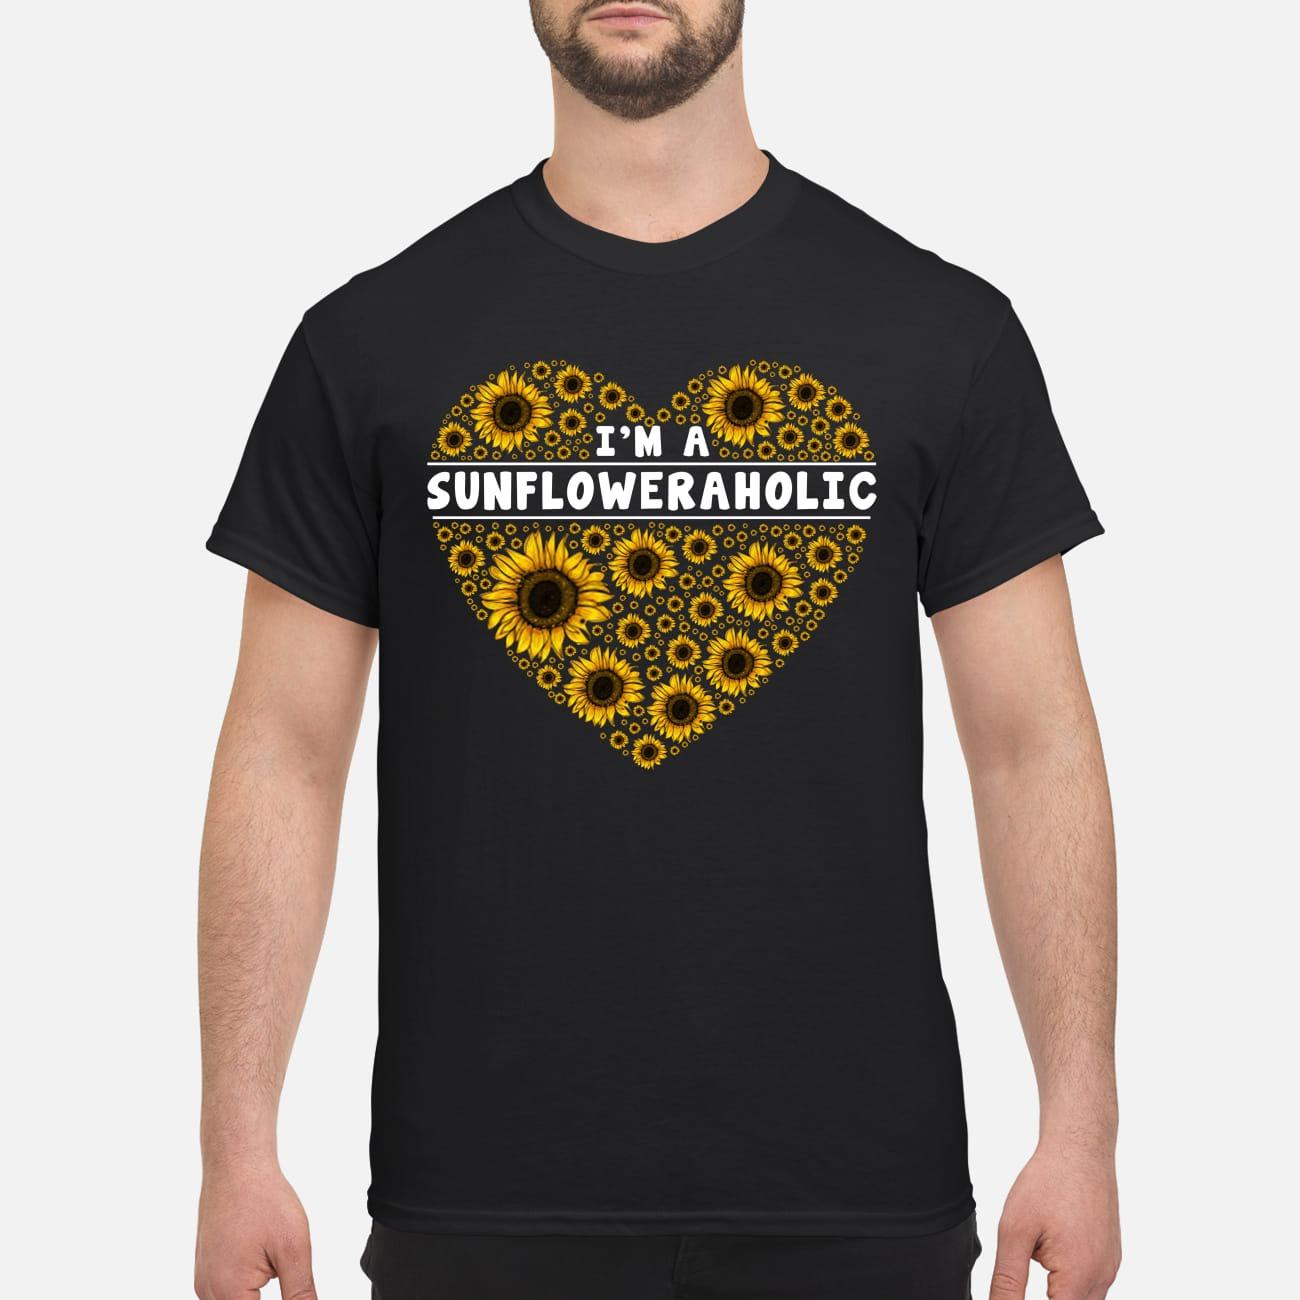 I'm a sunfloweraholic classic shirt